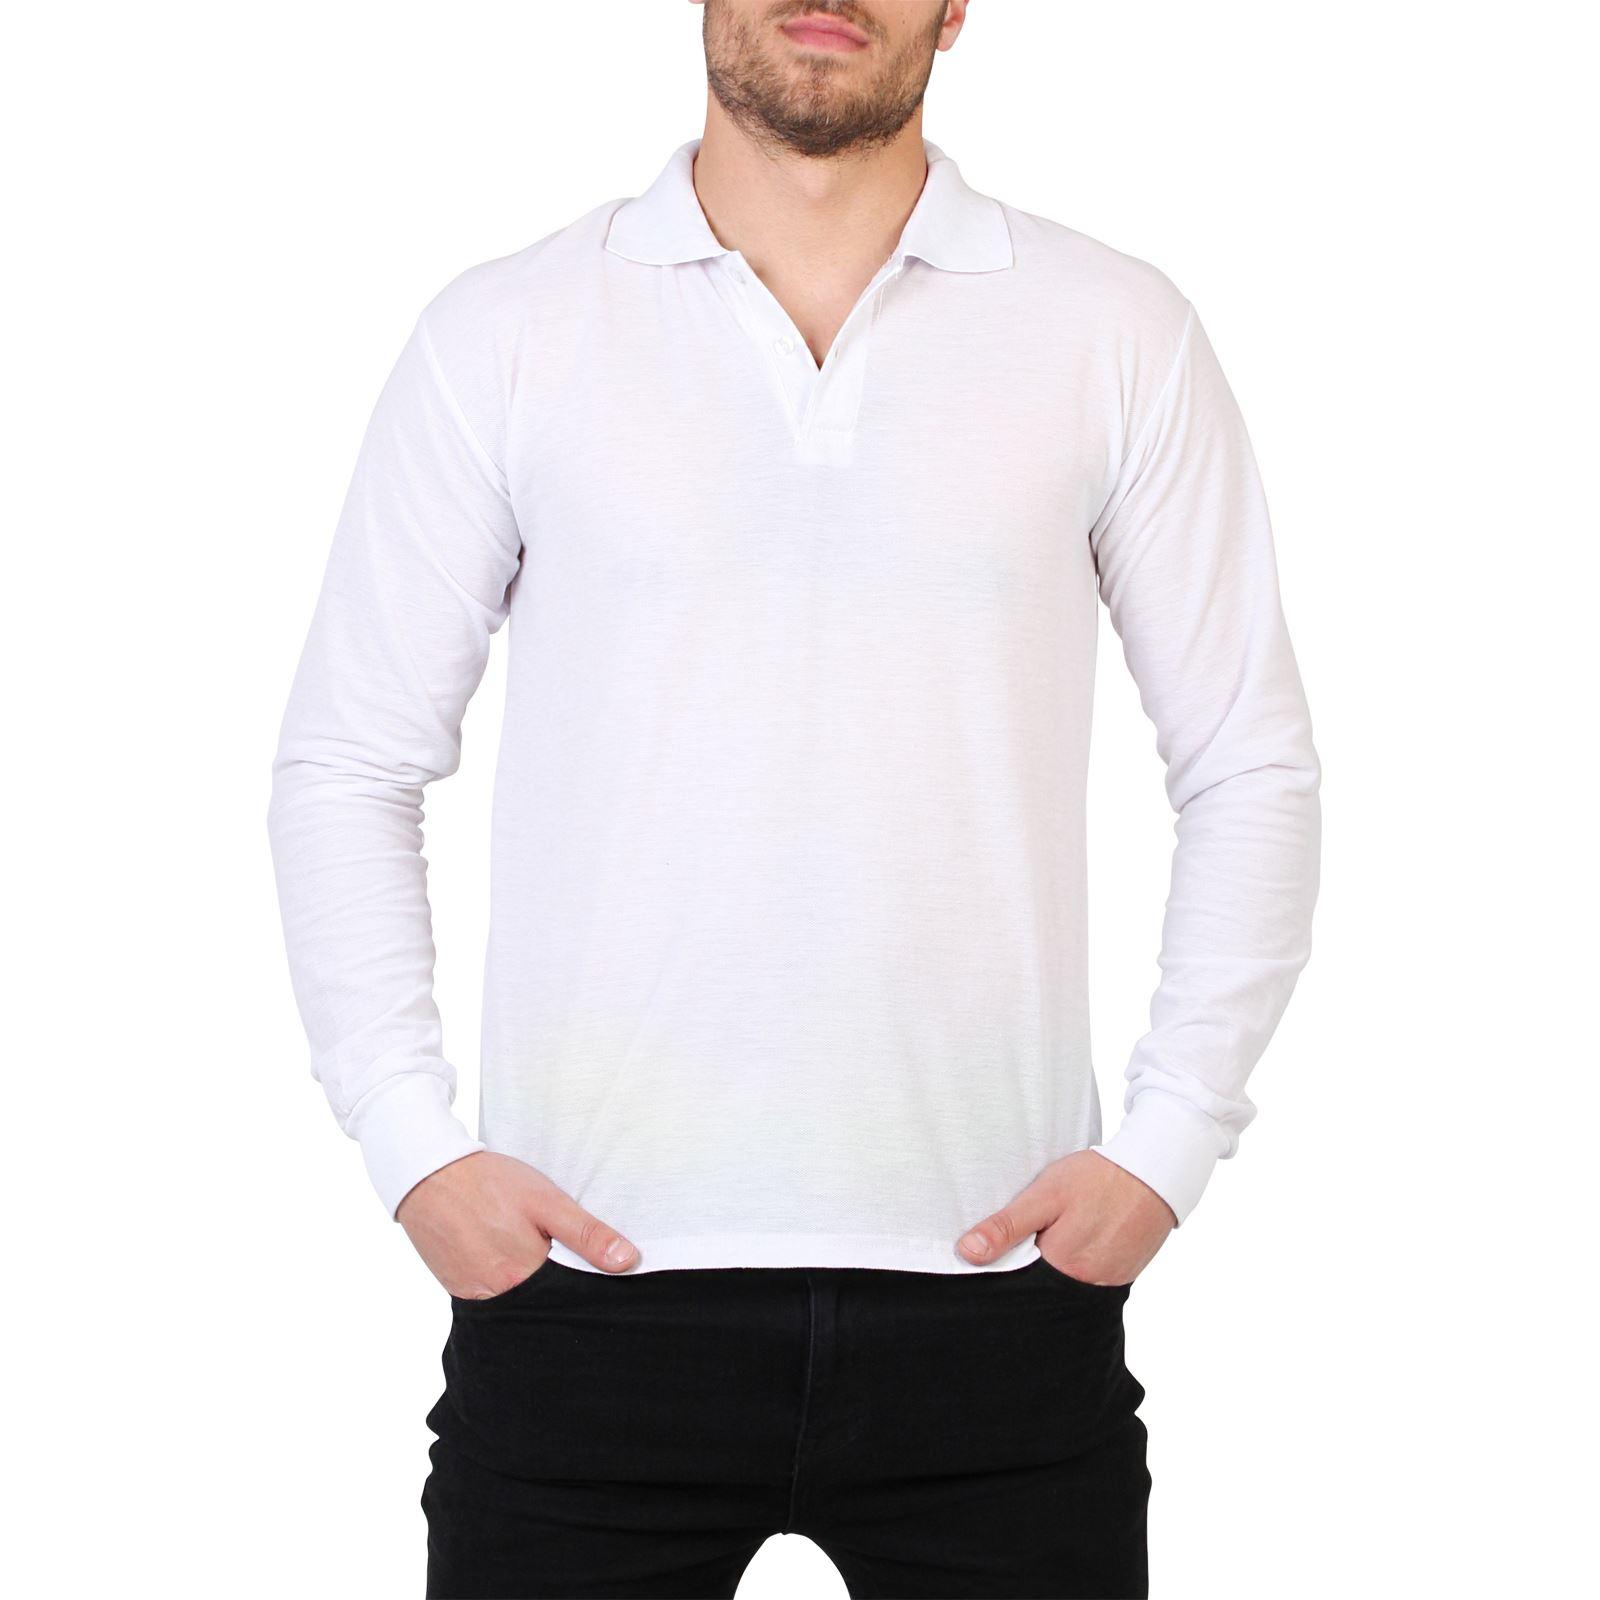 Mens casual long sleeve polo t shirt top plain regular for Mens casual collared shirts